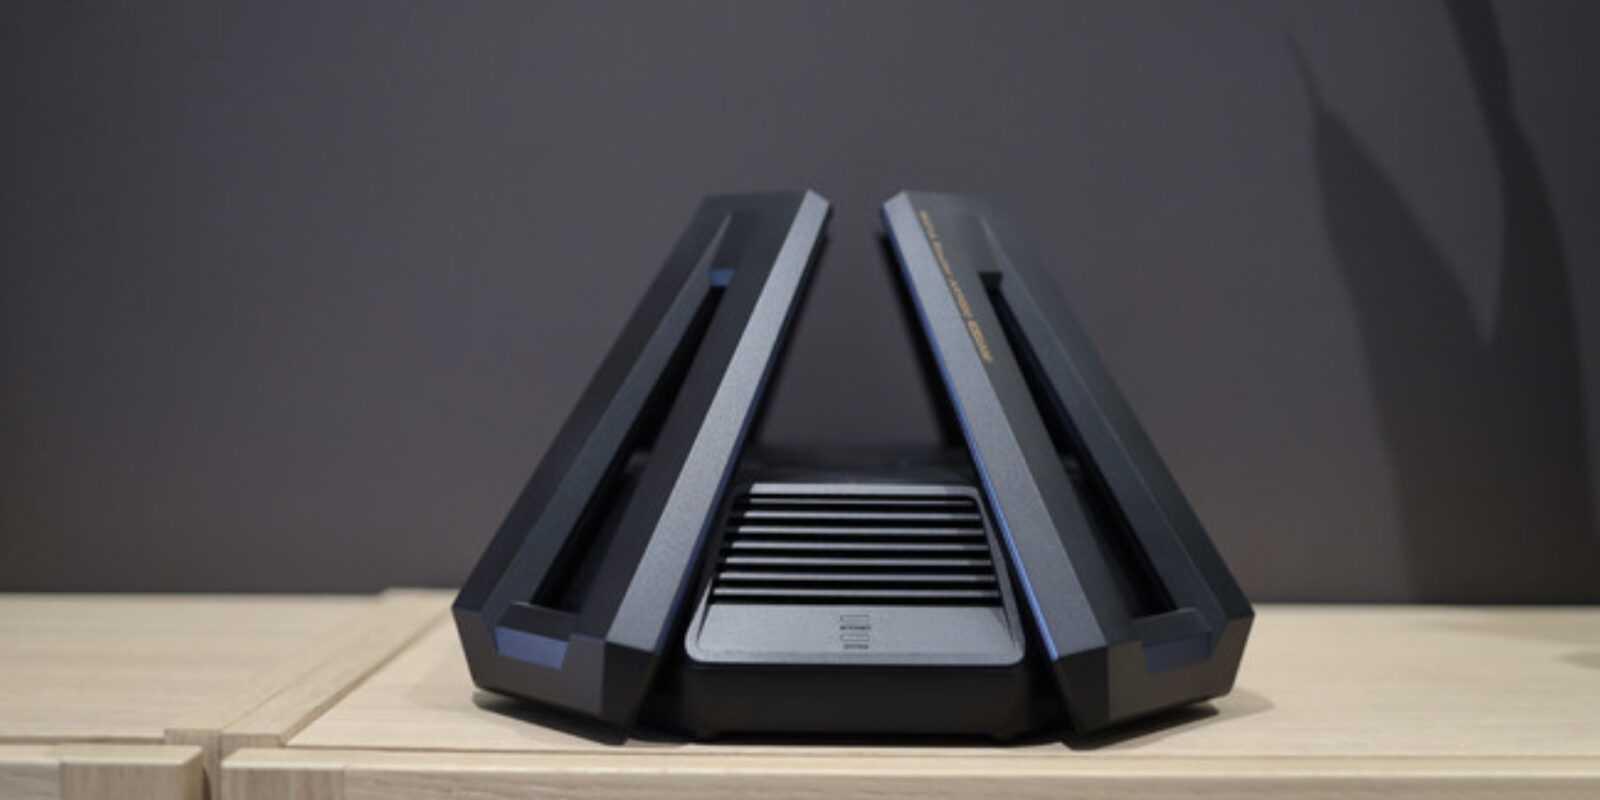 Mi AX9000: мощный трёхдиапазонный роутер стандарта Wi-Fi 6 от Xiaomi (snimok ekrana 2021 03 29 v 18.48 1617033020)